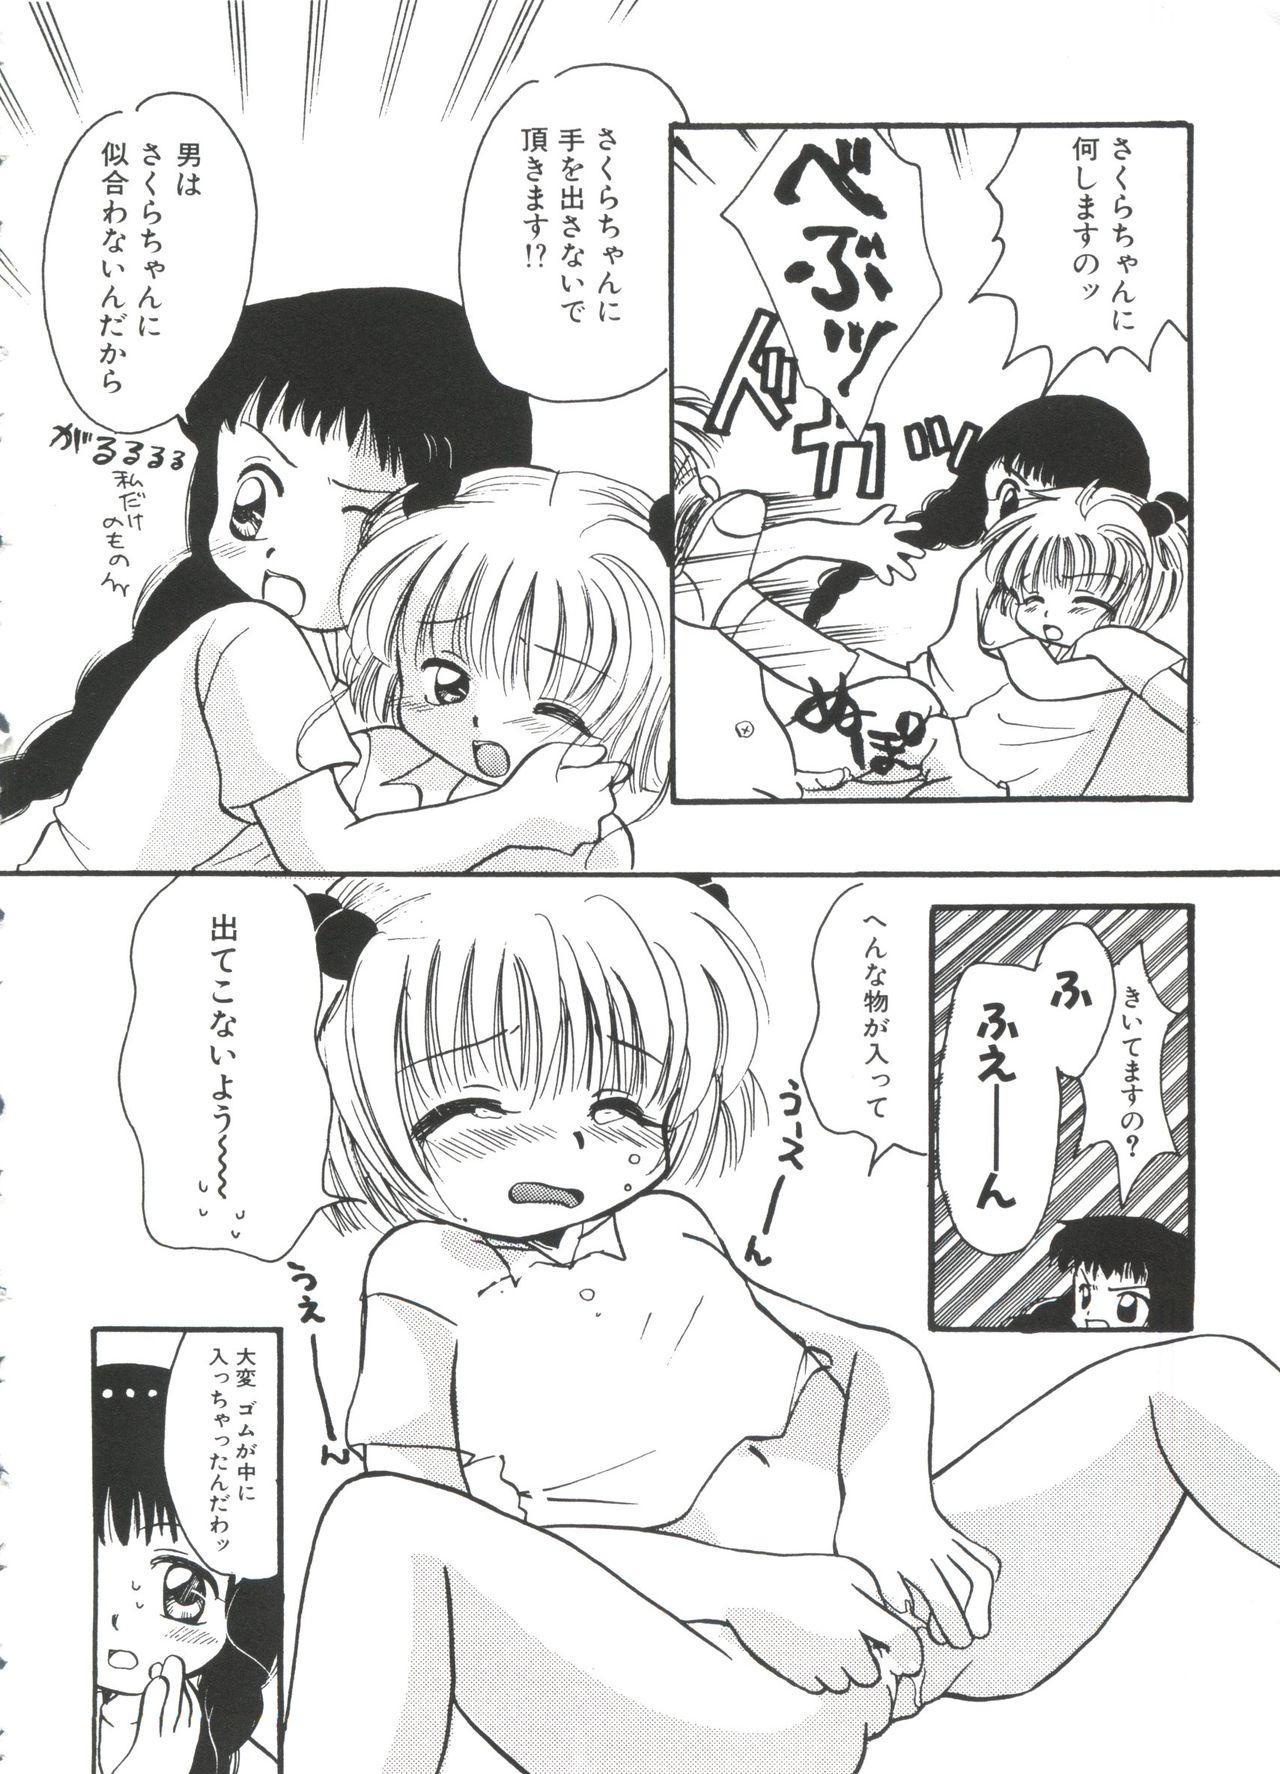 Ero-chan to Issho 2 151